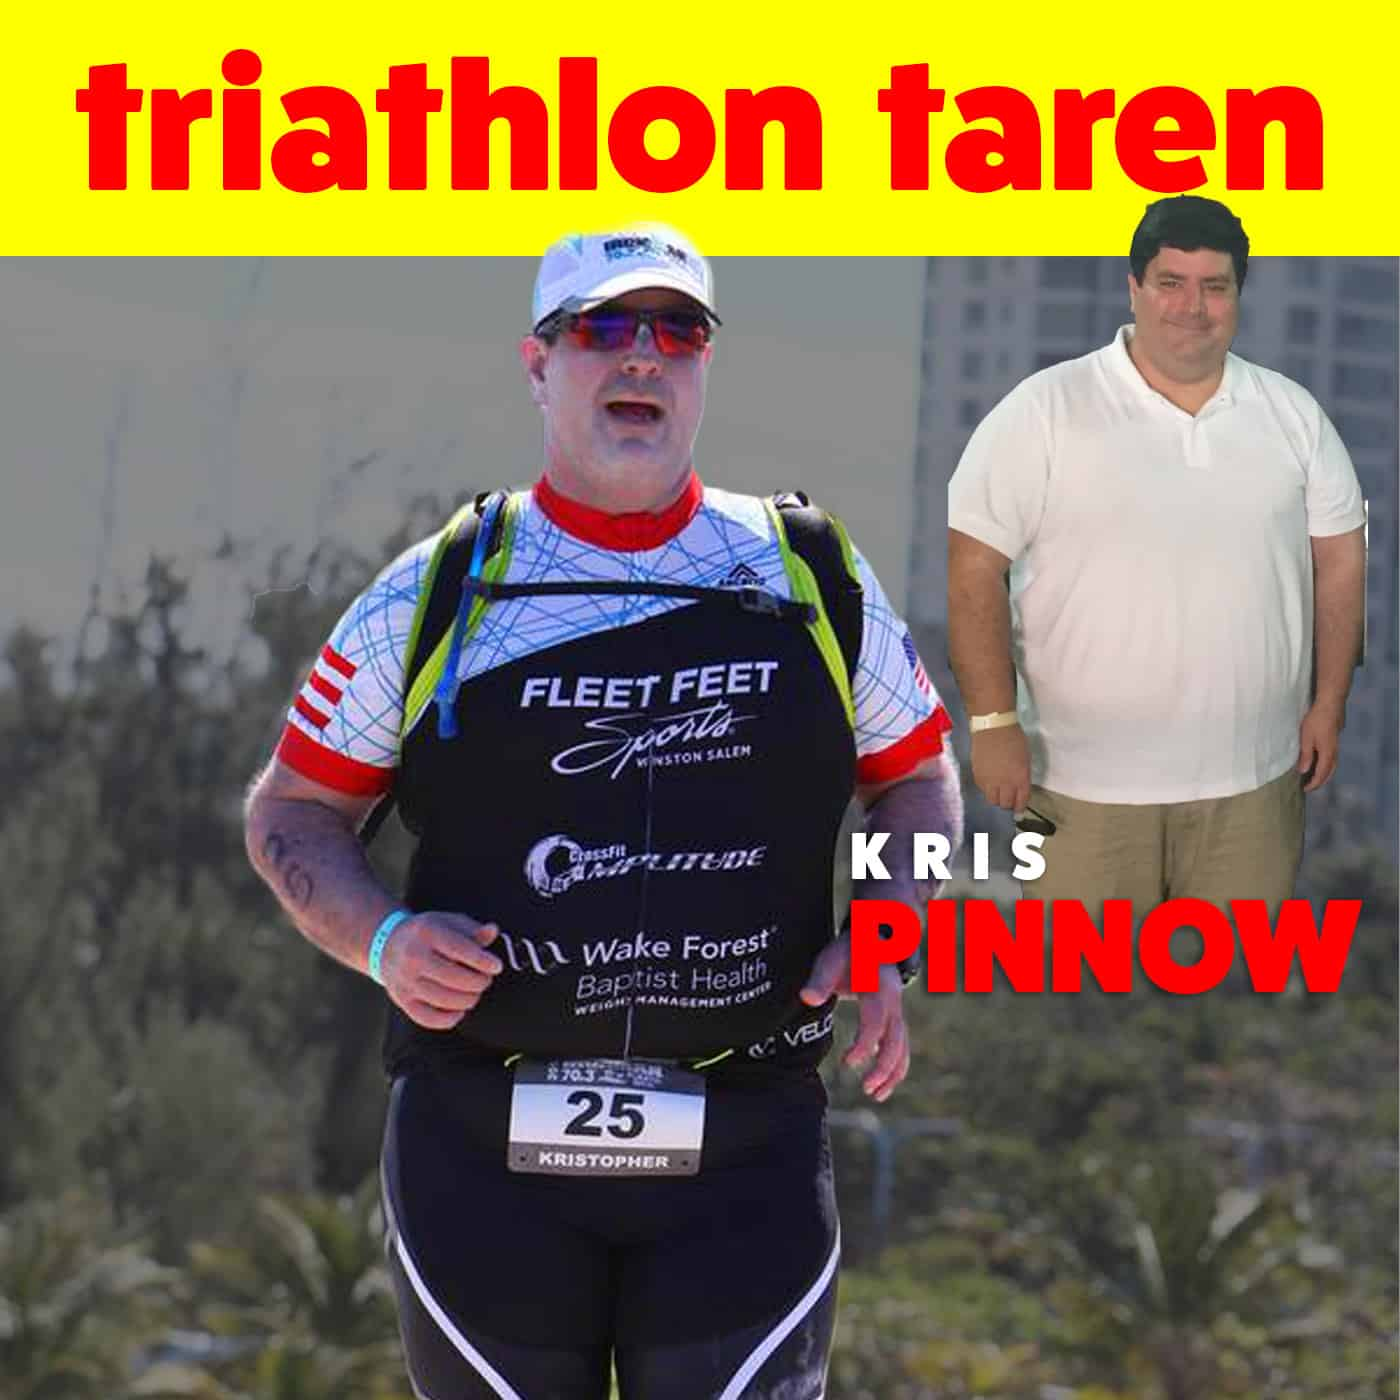 Weight Loss Transformation Triathlon Story | Kris Pinnow